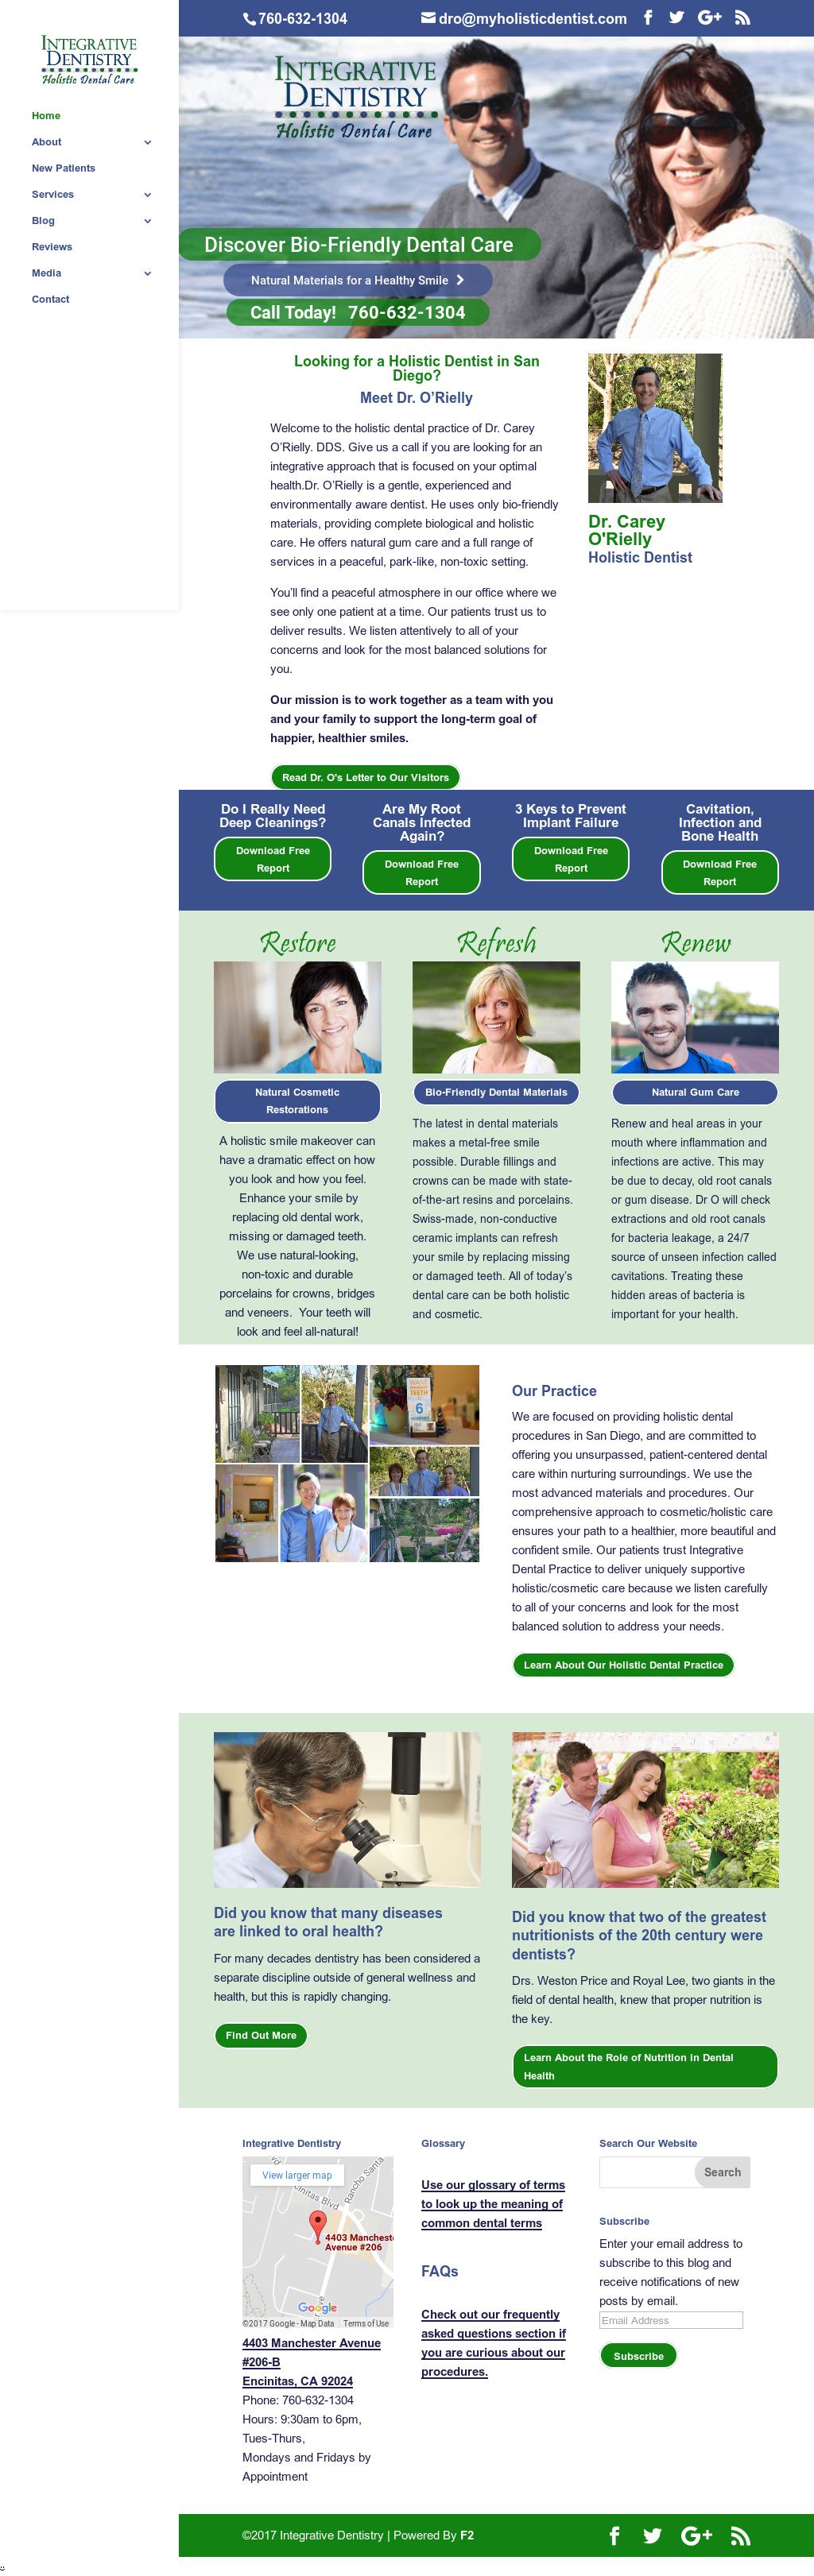 Integrative Dentistry, San Diego Holistic Dentist Competitors